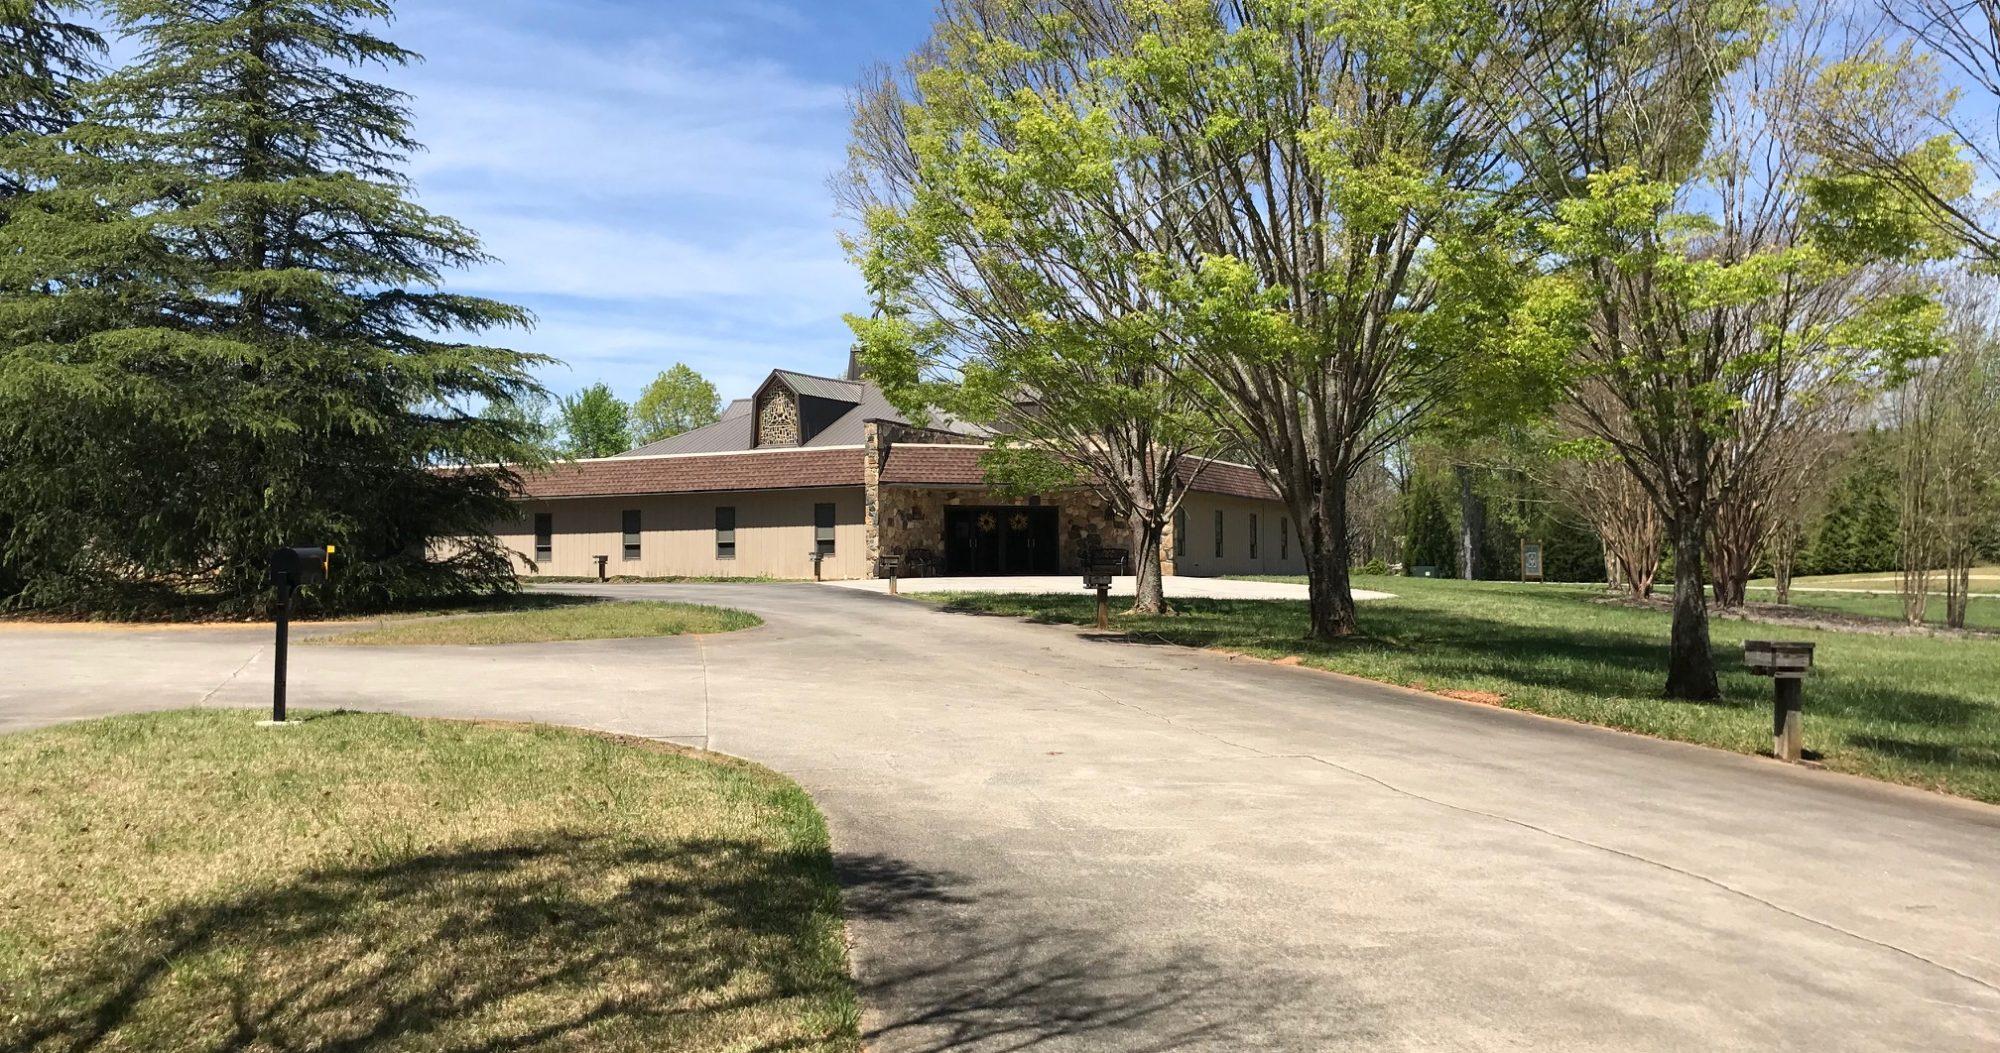 Mountain Rest Baptist Church